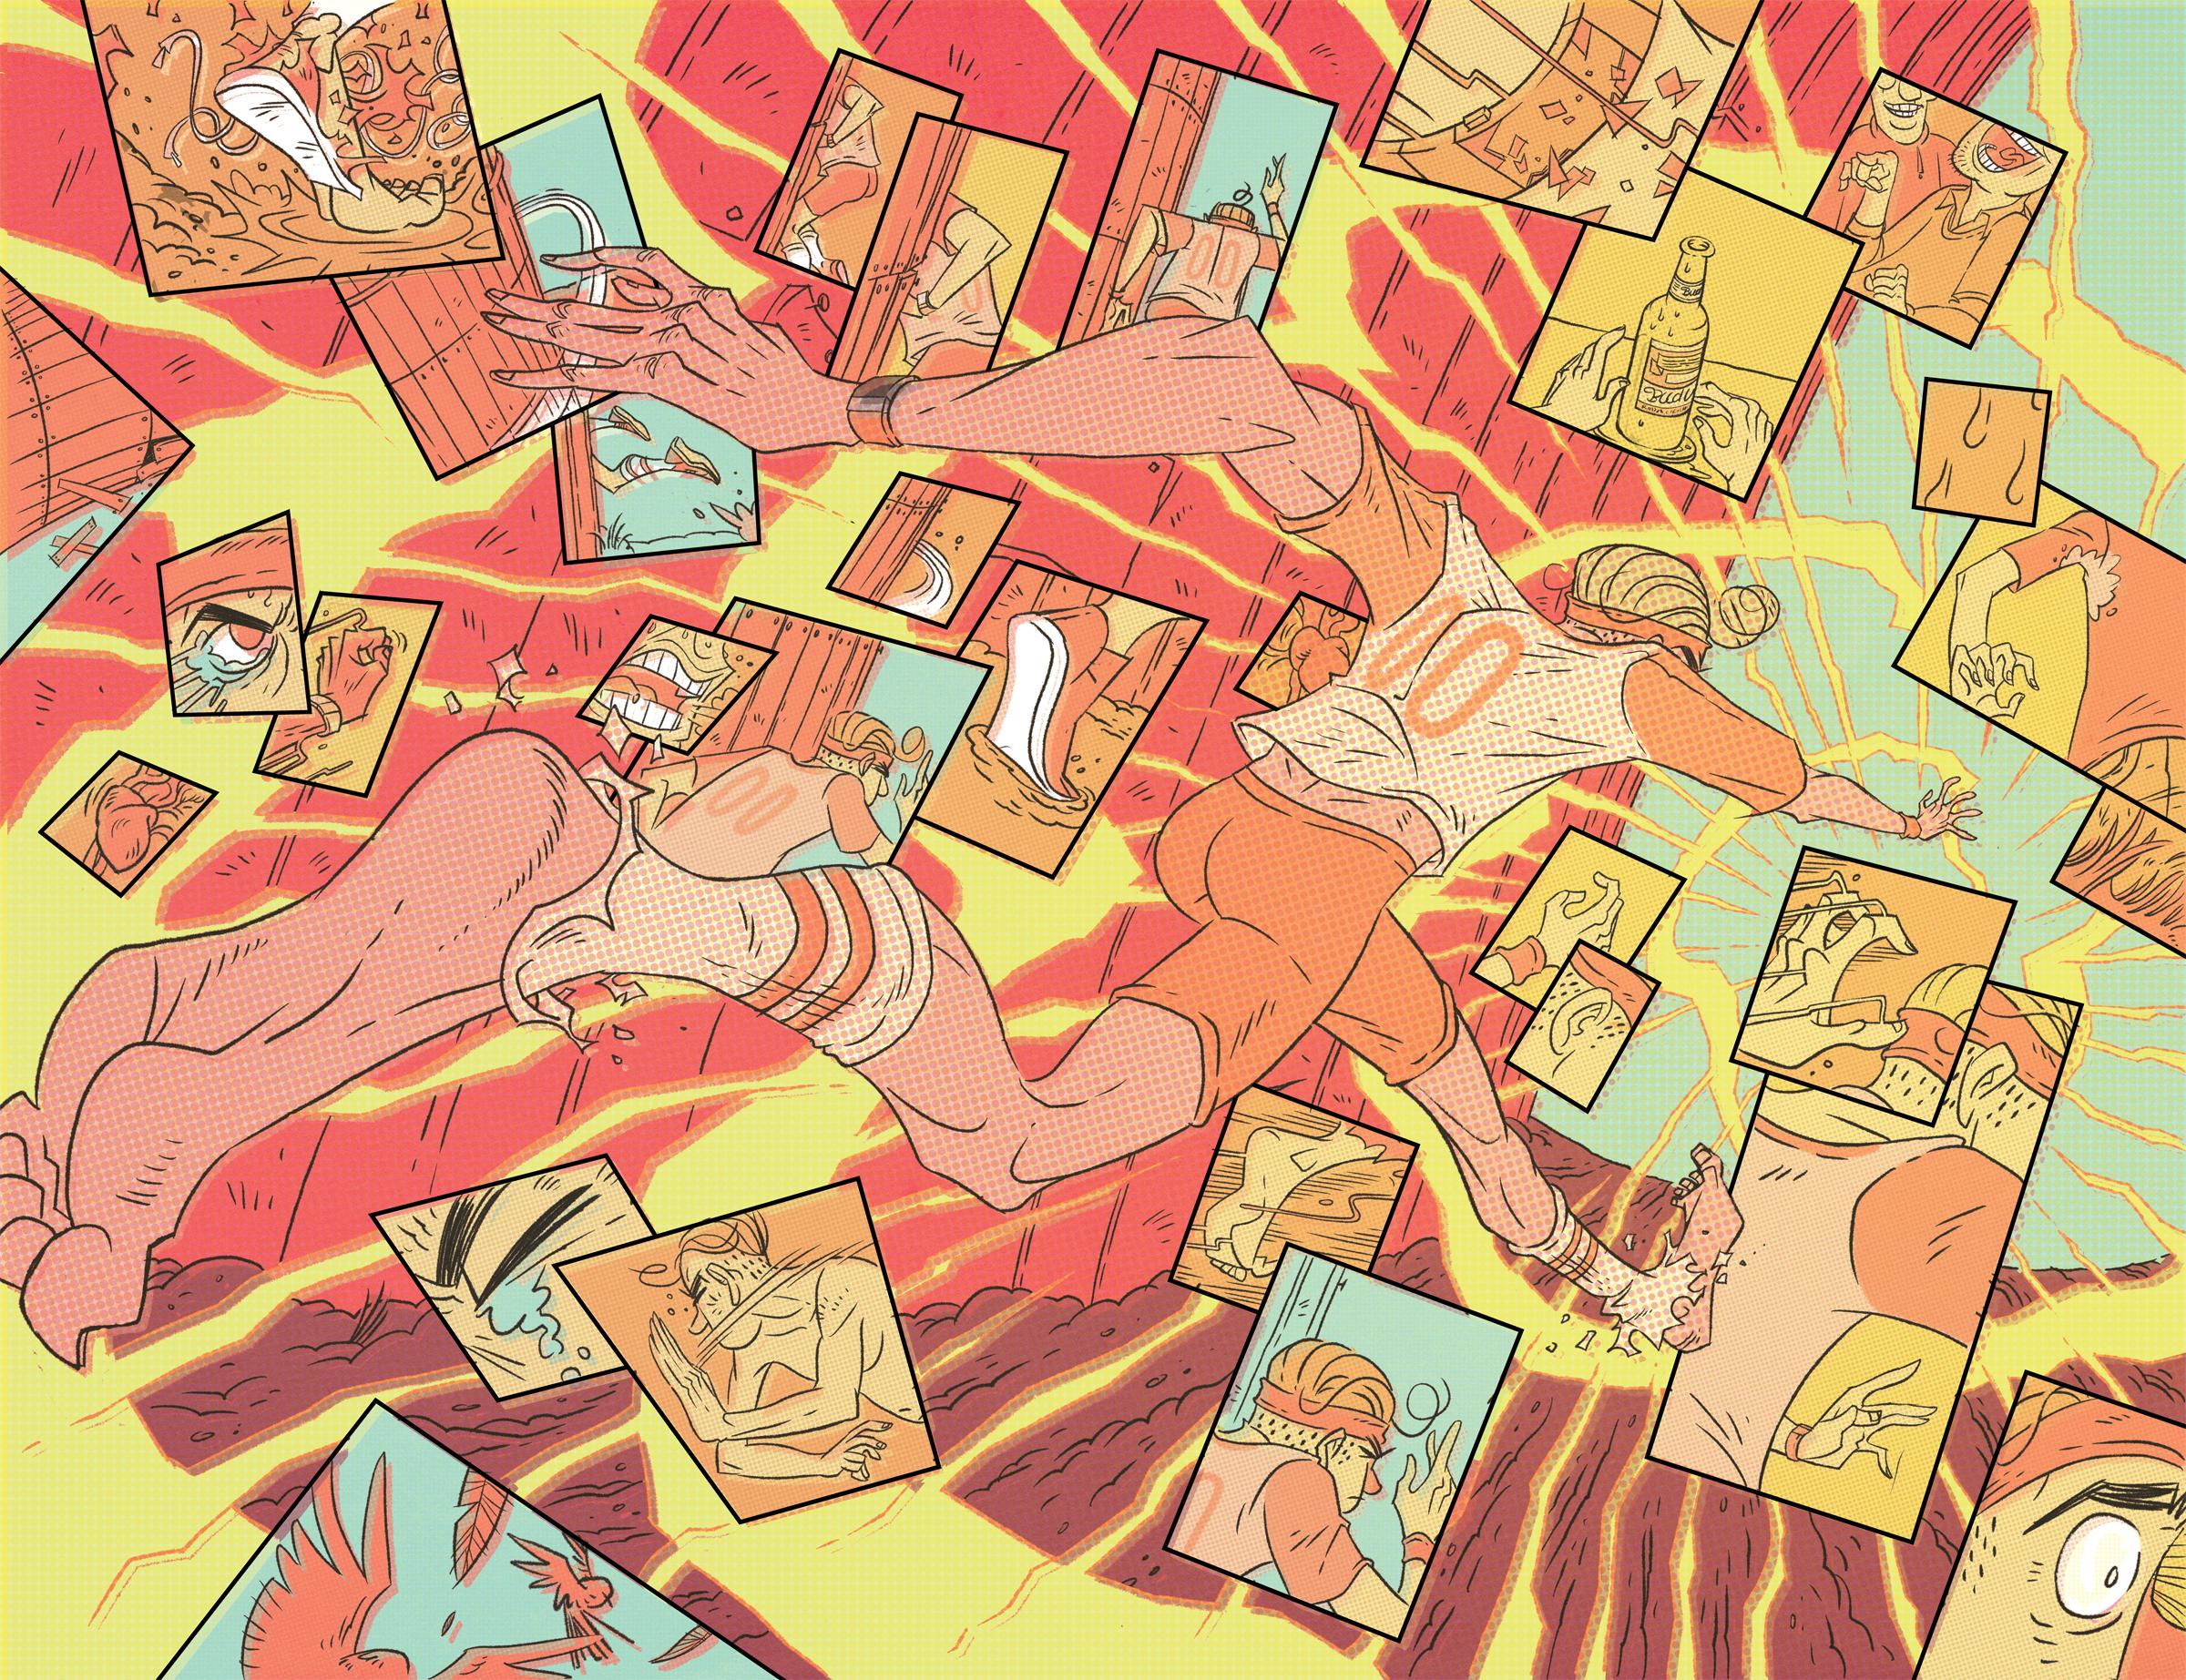 nick johnson's Work Image 10